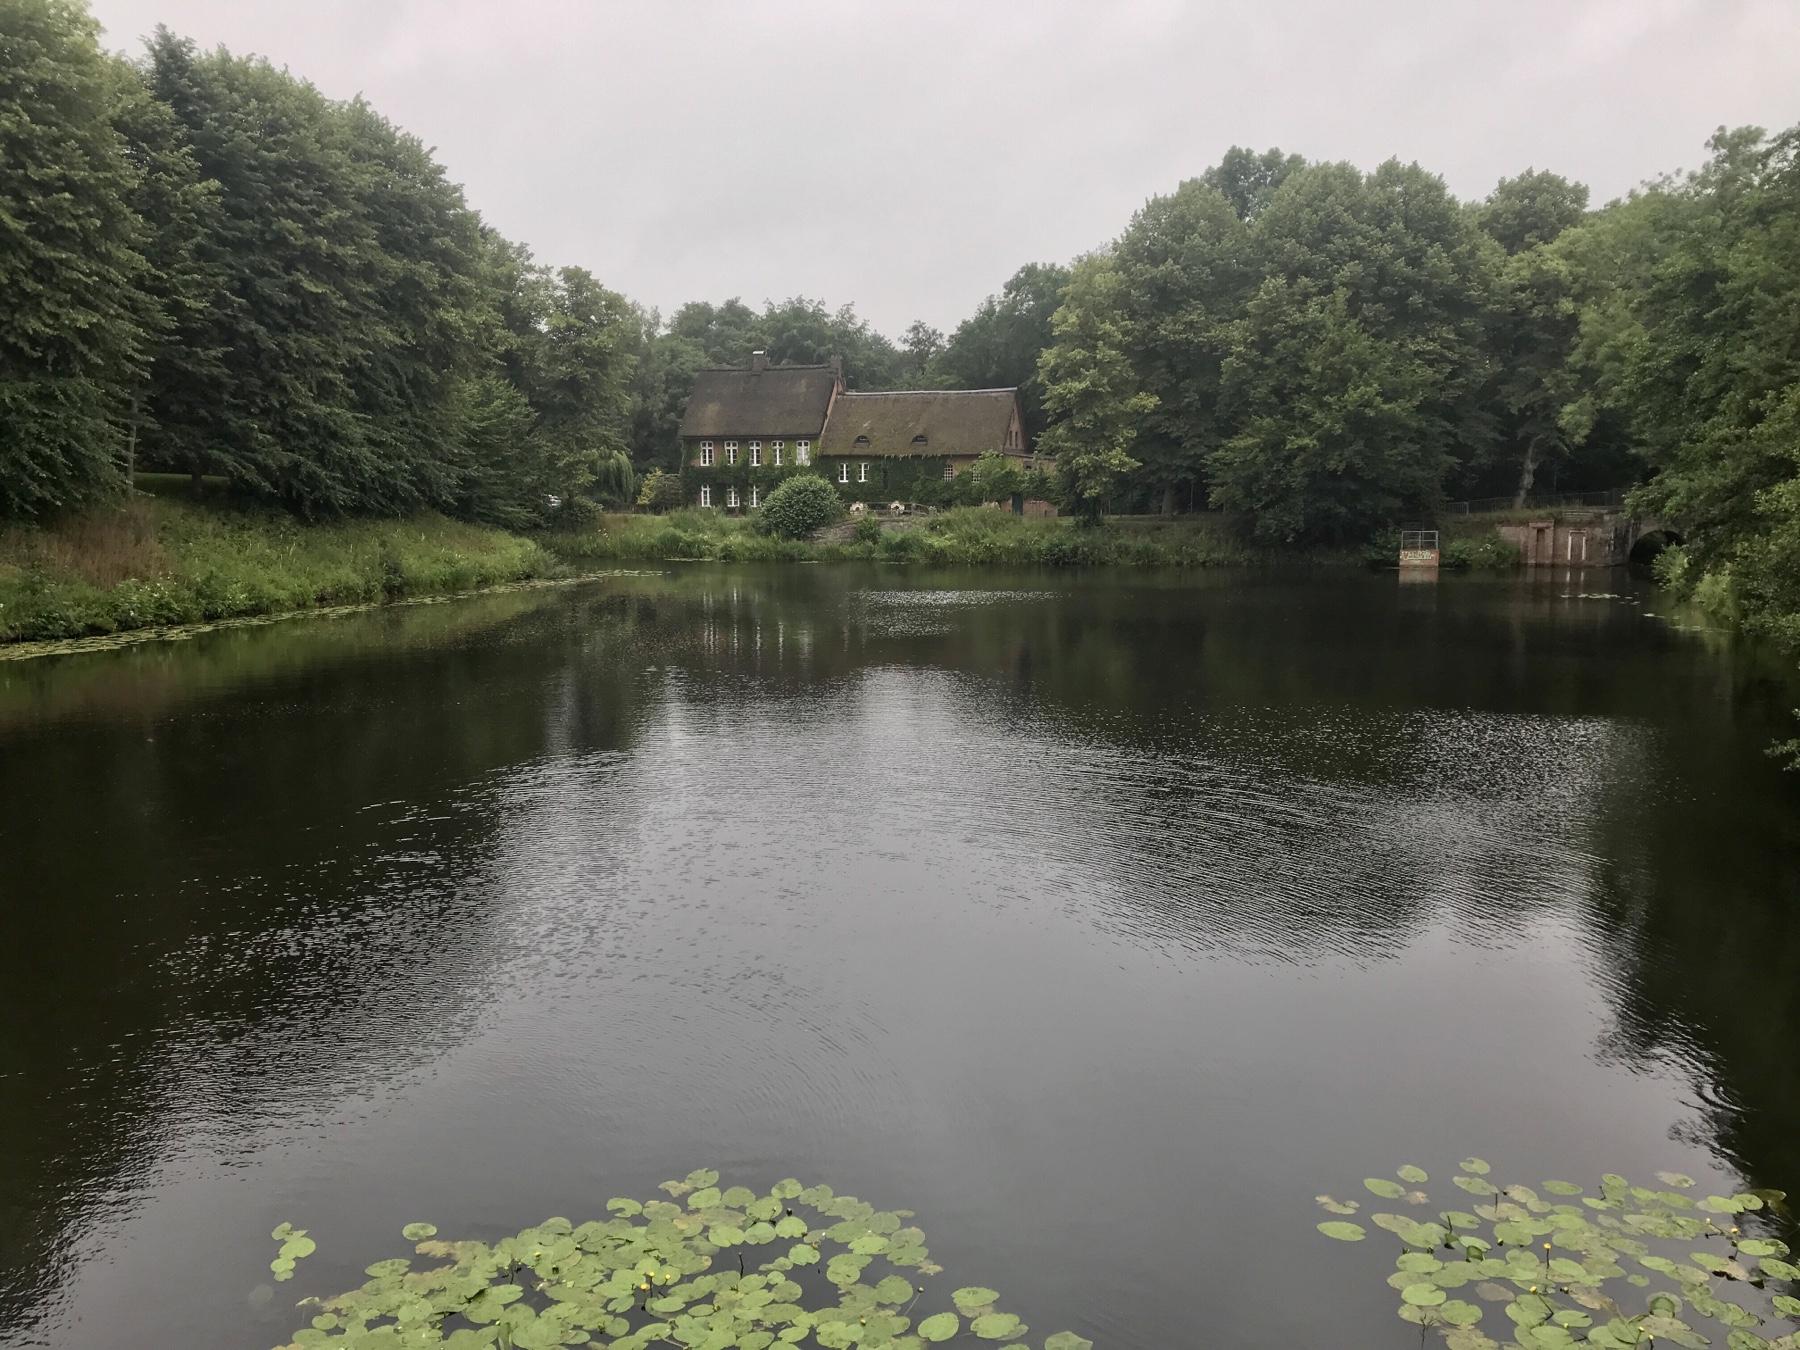 Blick über den Ahrensburger Mühlenteich, Schloss Ahrensburg, Stormarnweg Etappe 3